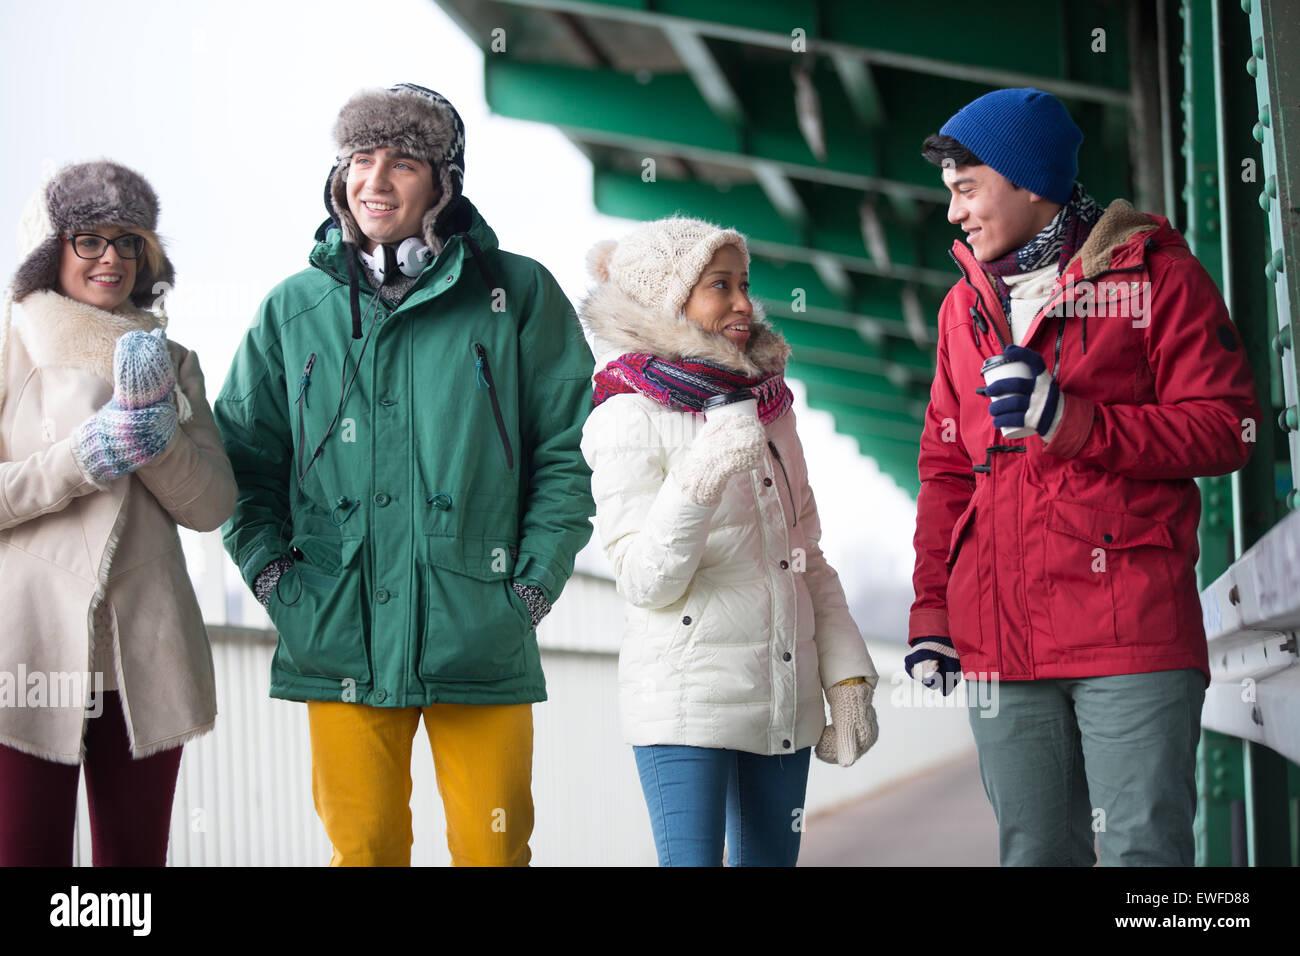 Multiethnic friends in winter wear conversing outdoors - Stock Image